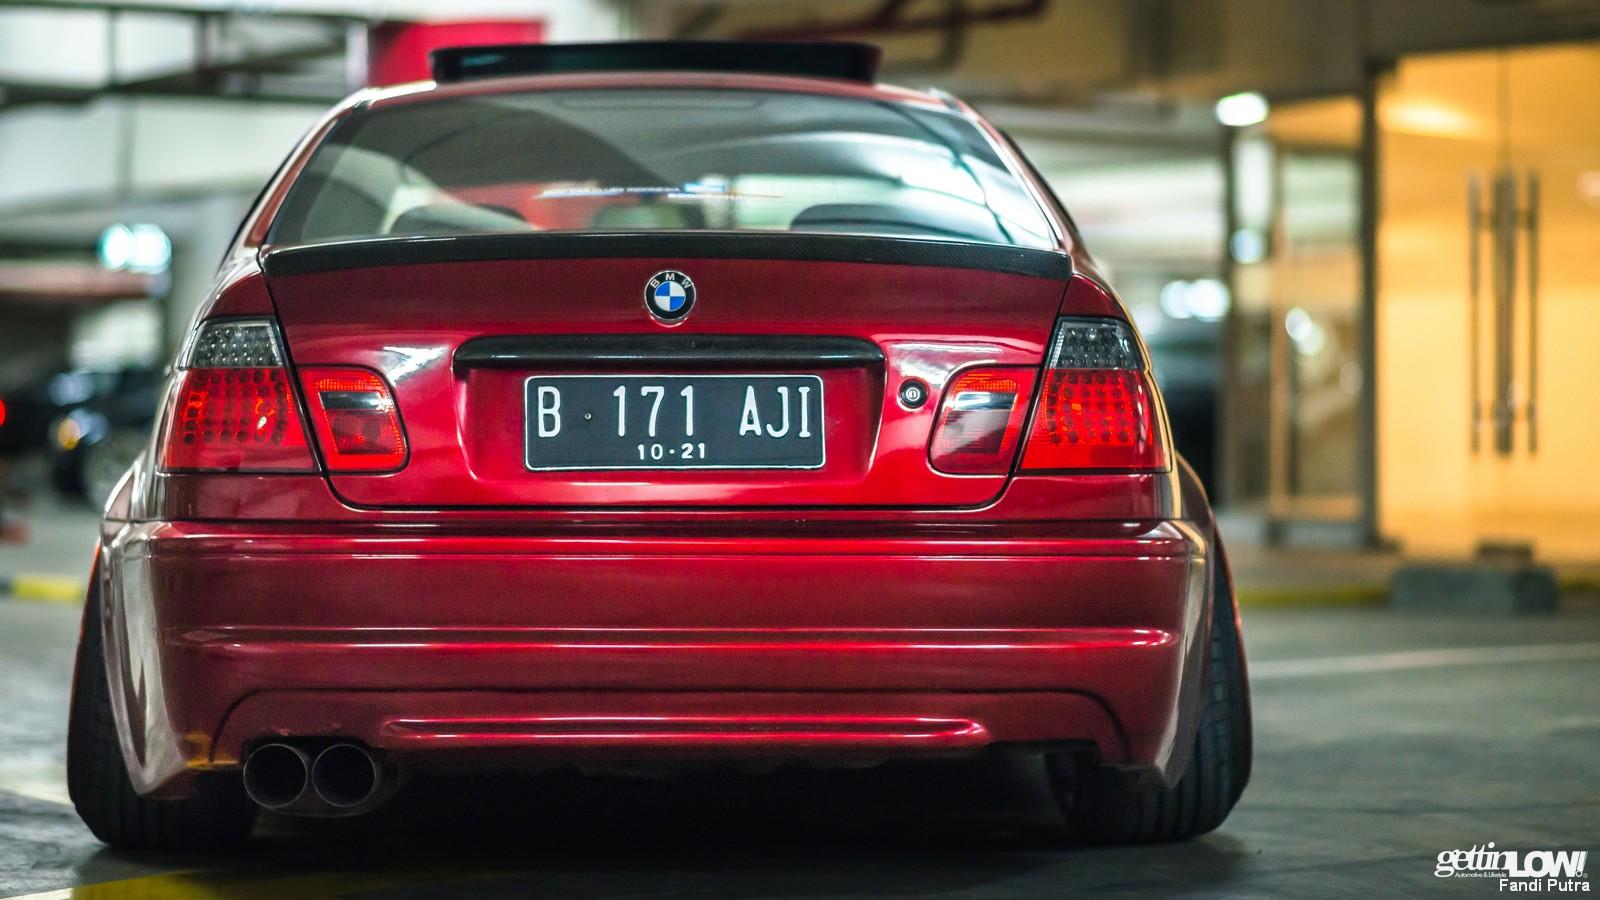 BMW-Maroon-gesrex_17